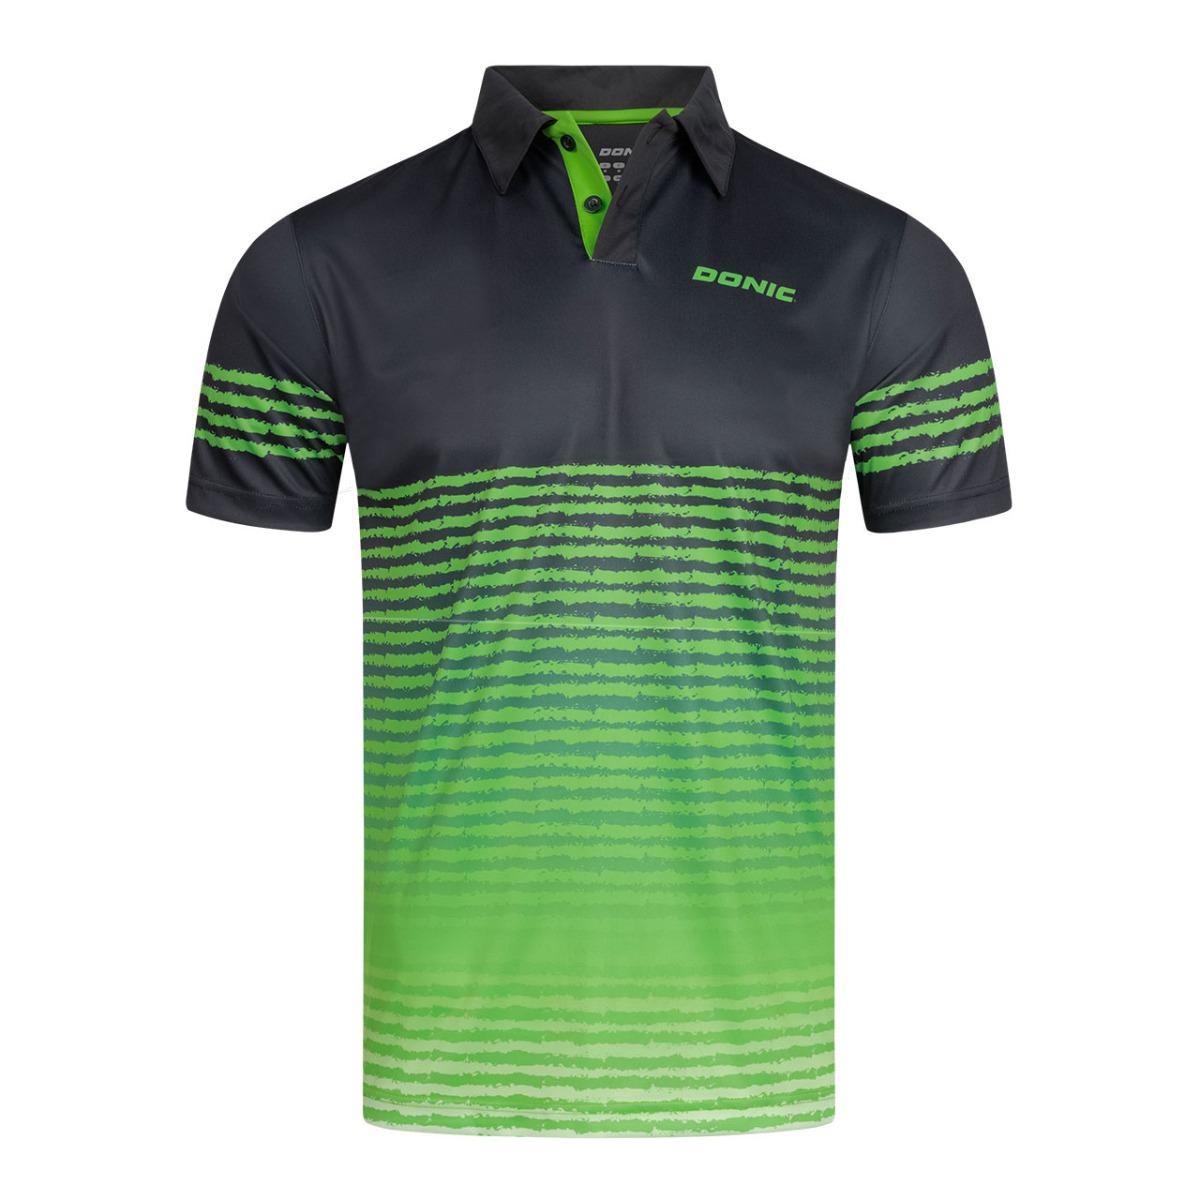 Donic Libra Green